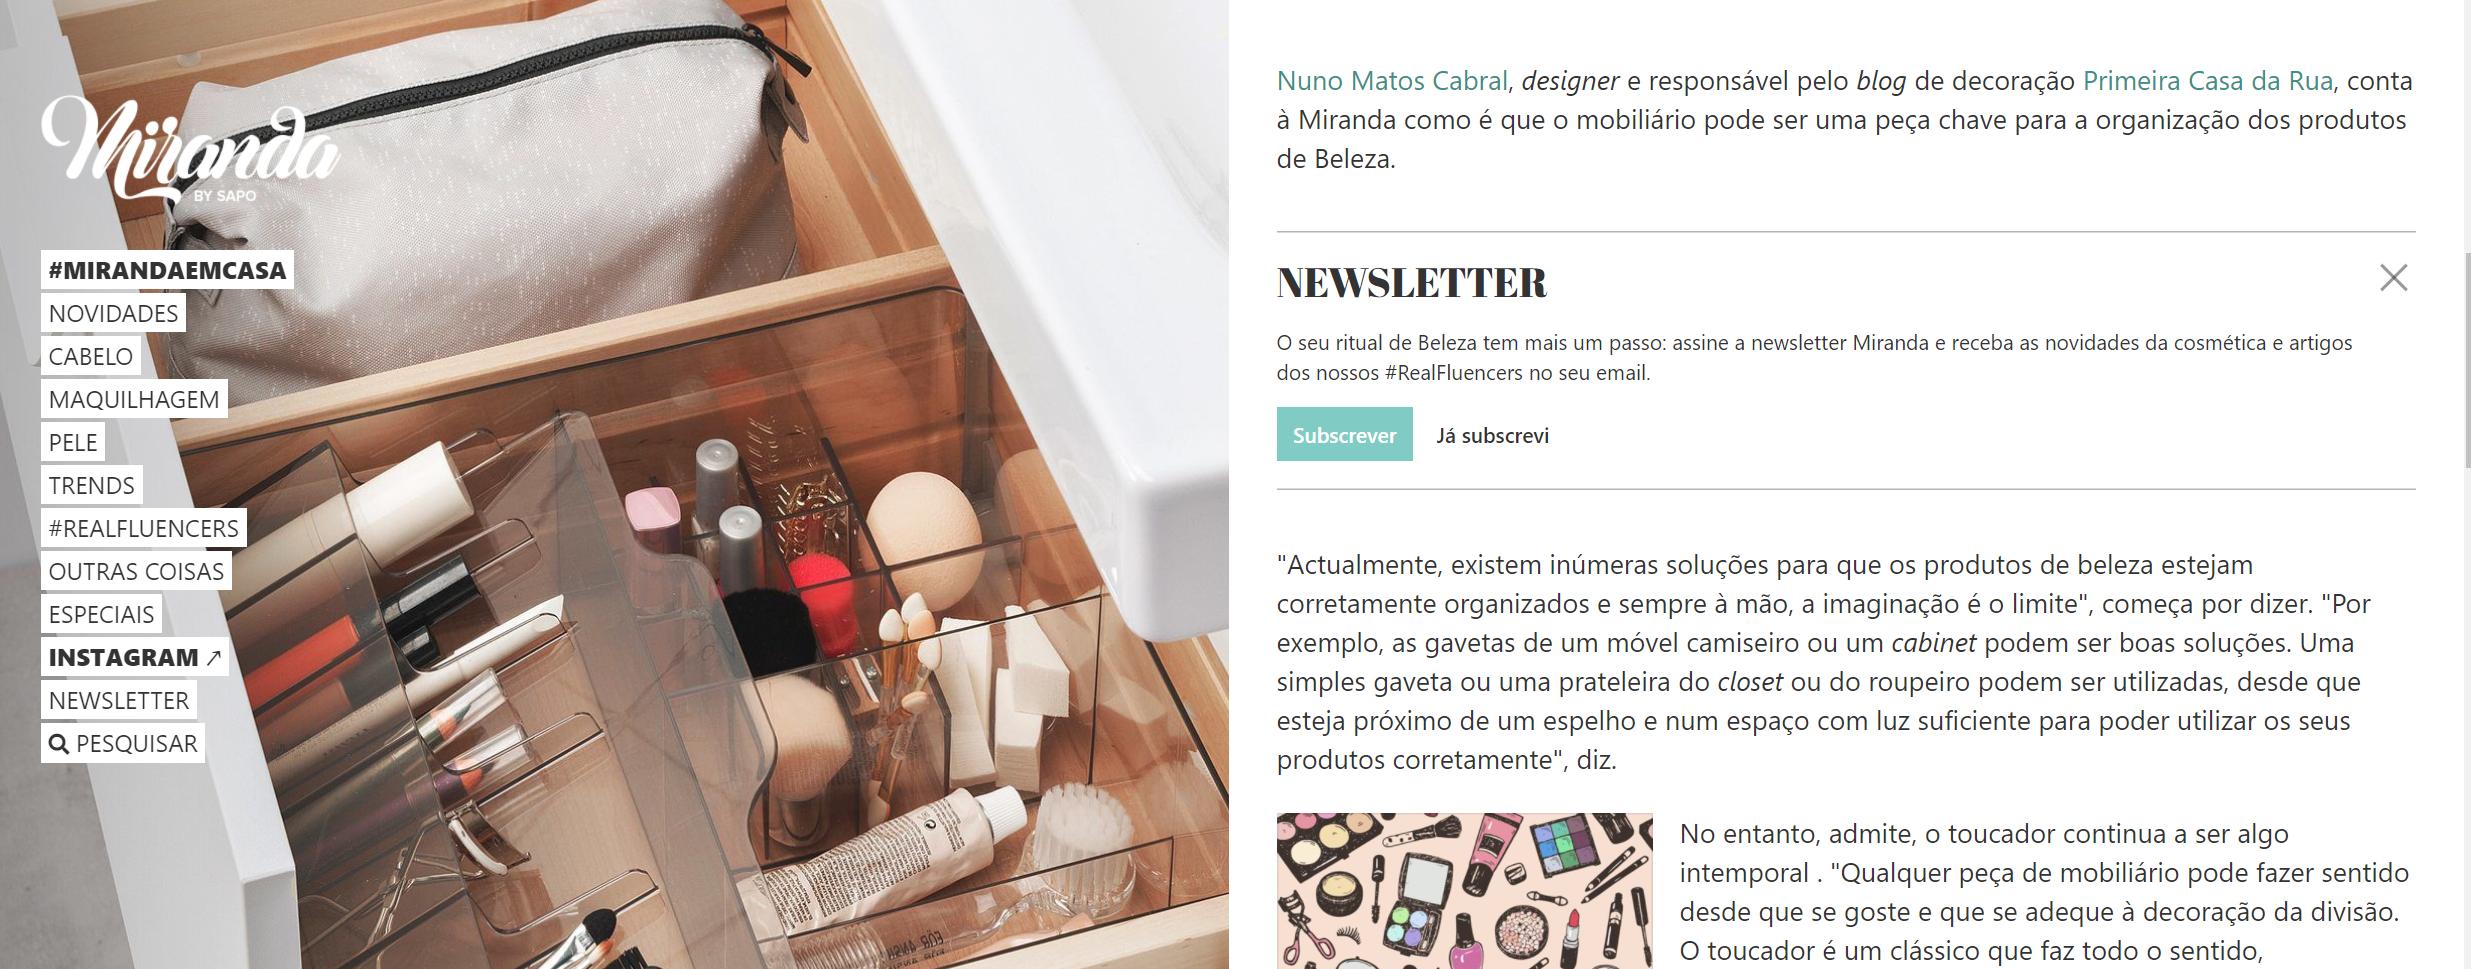 Nuno Matos Cabral @ Miranda by Sapo